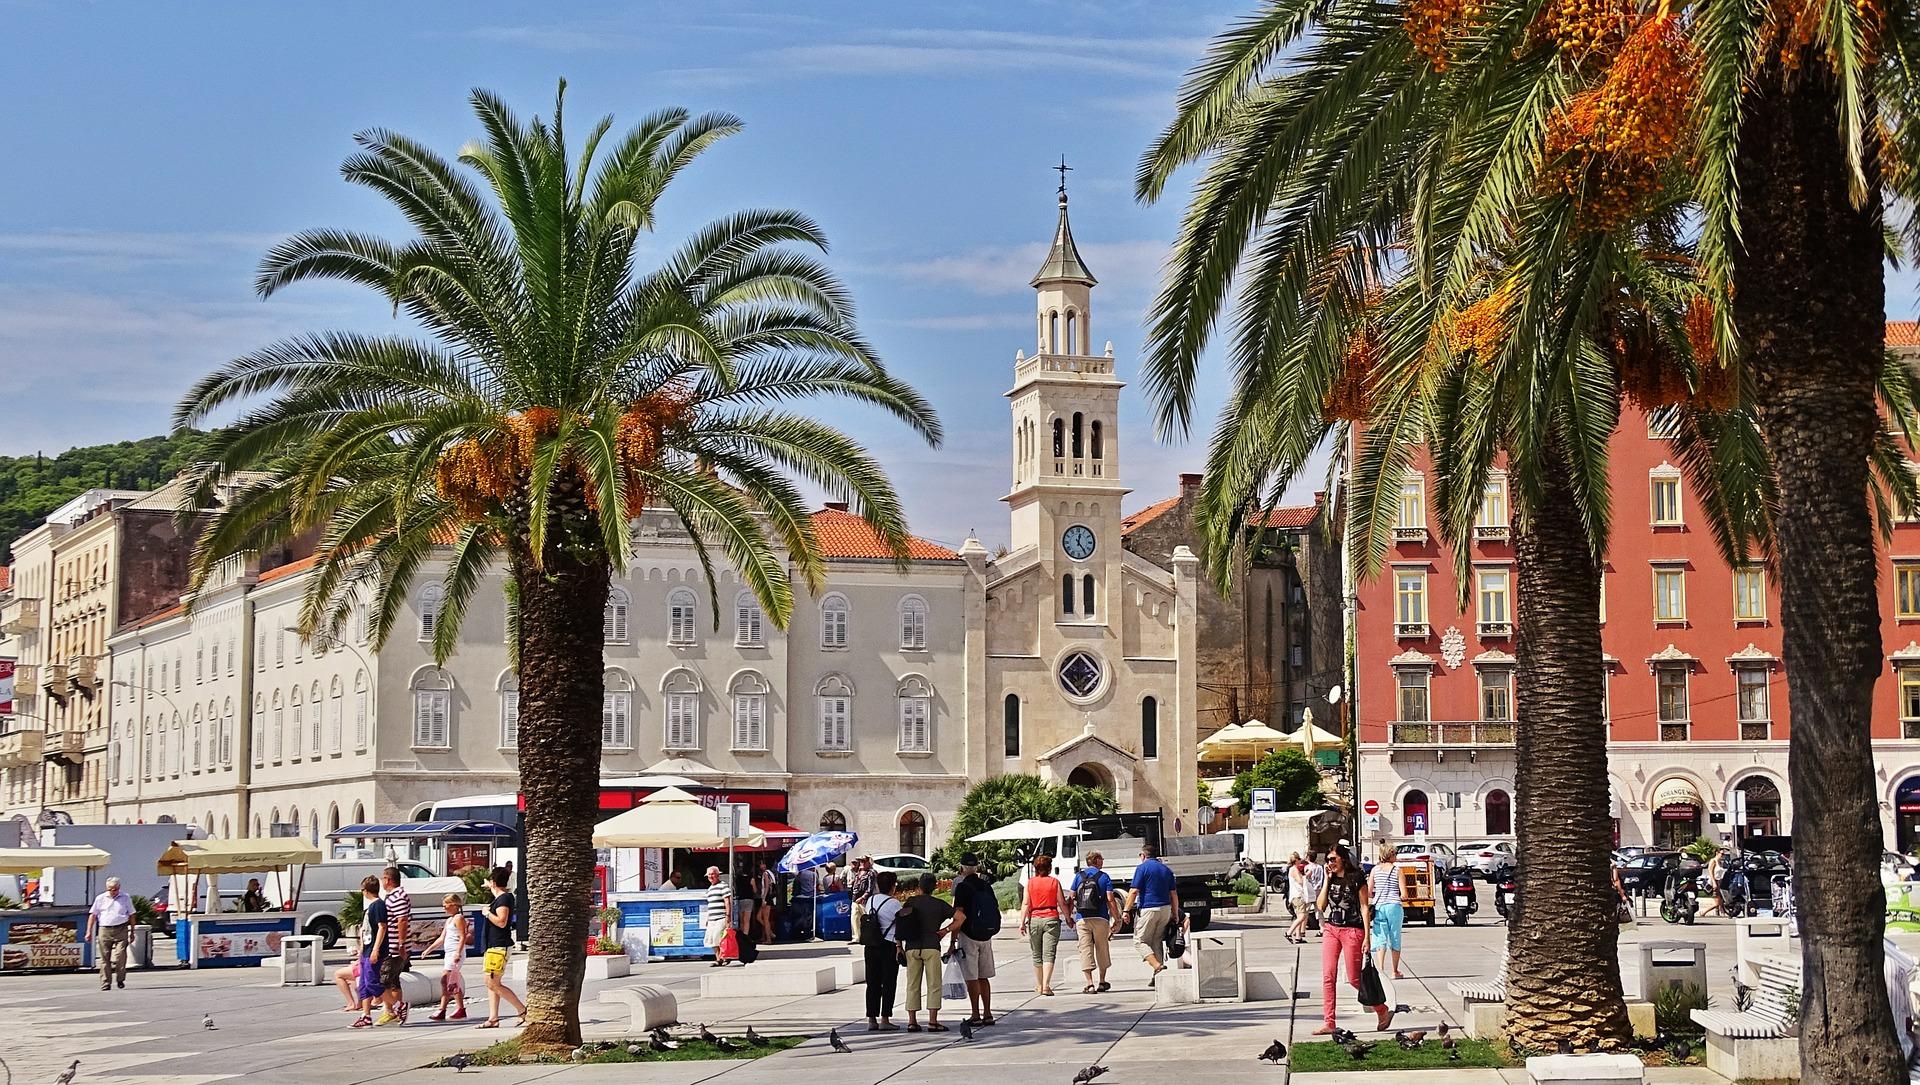 wp-content/uploads/itineraries/Croatia/croatia-split-3.jpg